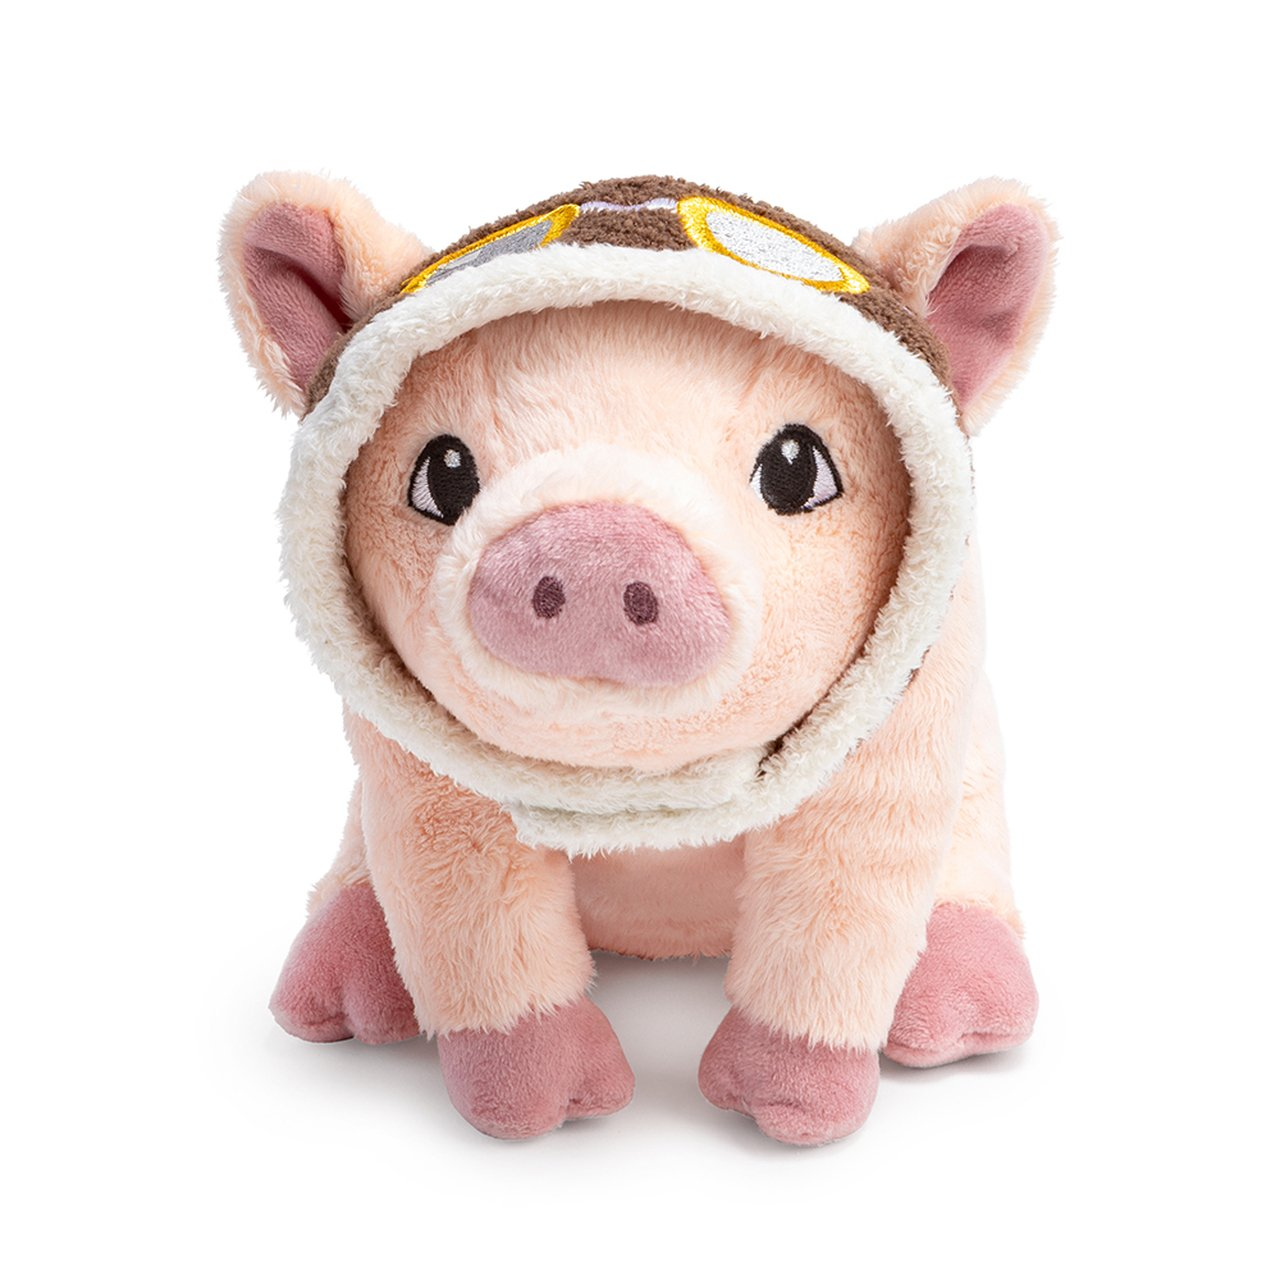 Maybe Plush Pig